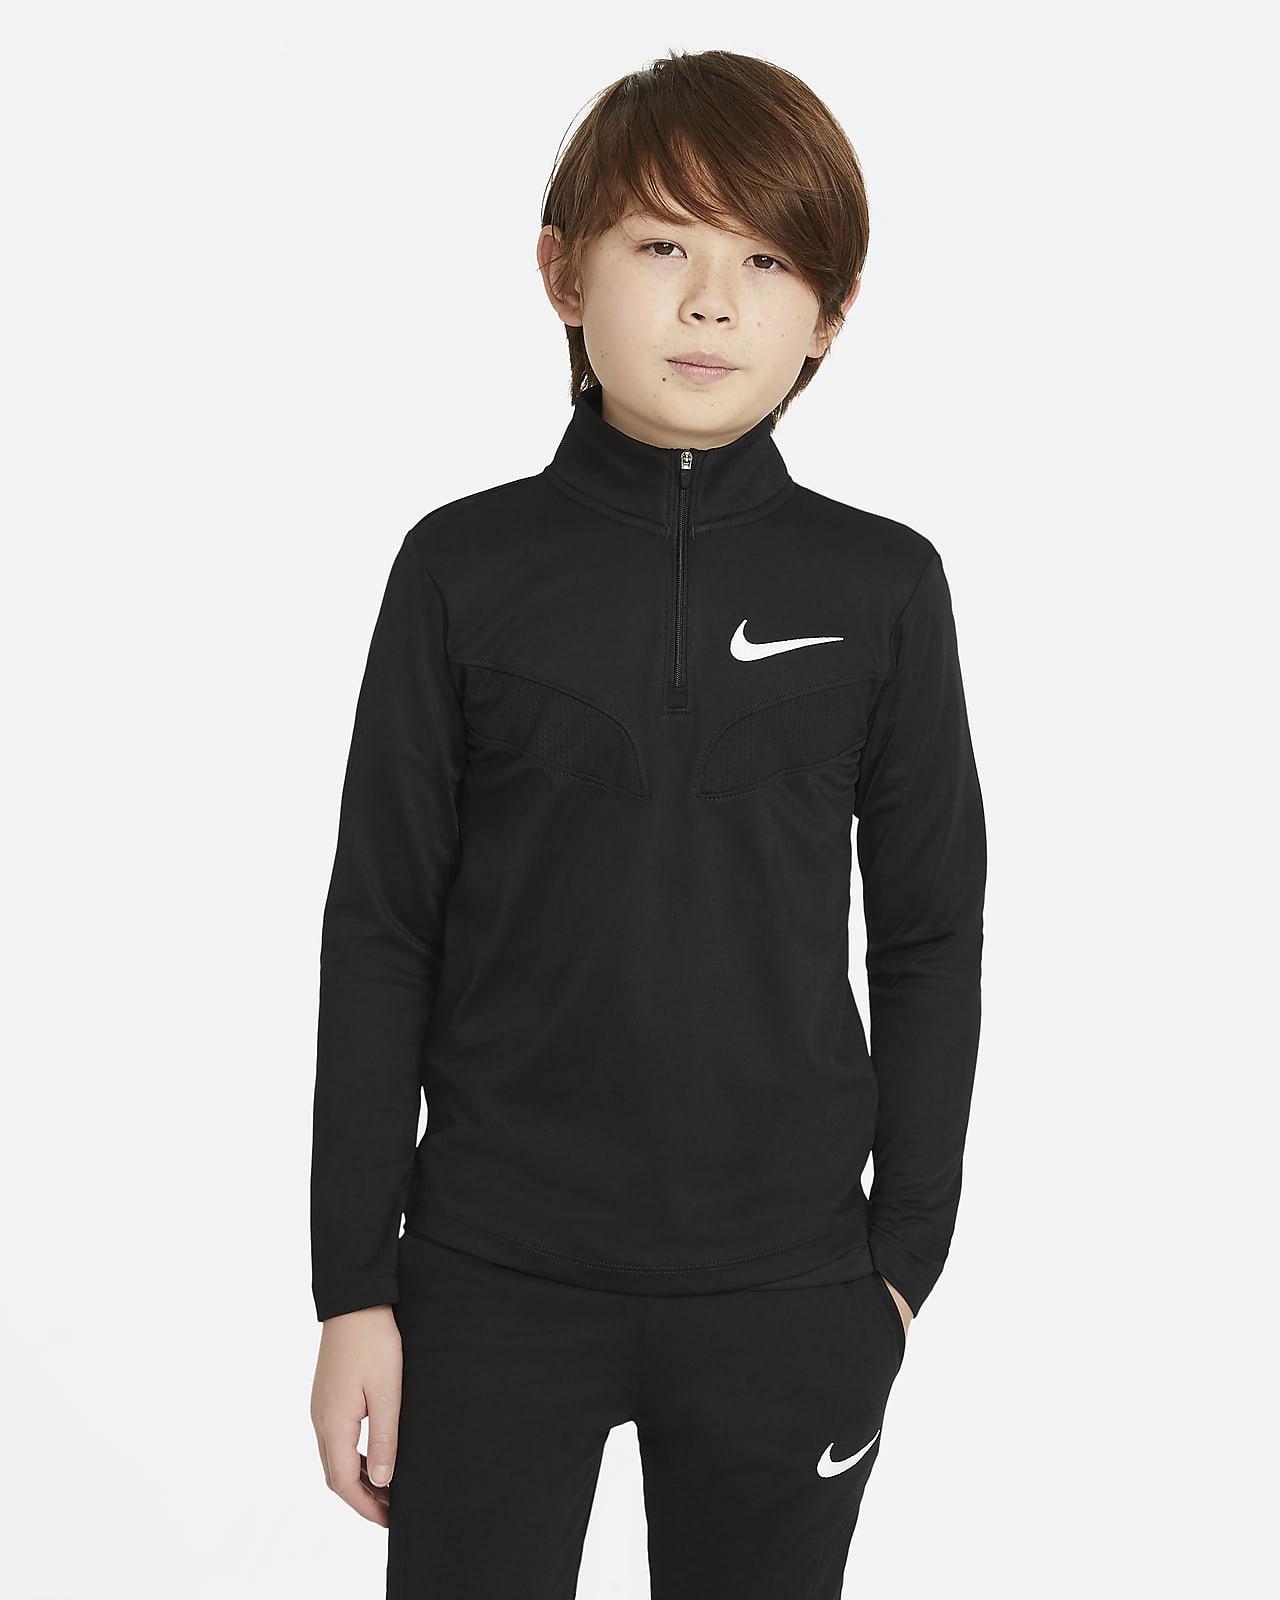 Nike Sport Older Kids' (Boys') Long-Sleeve Training Top